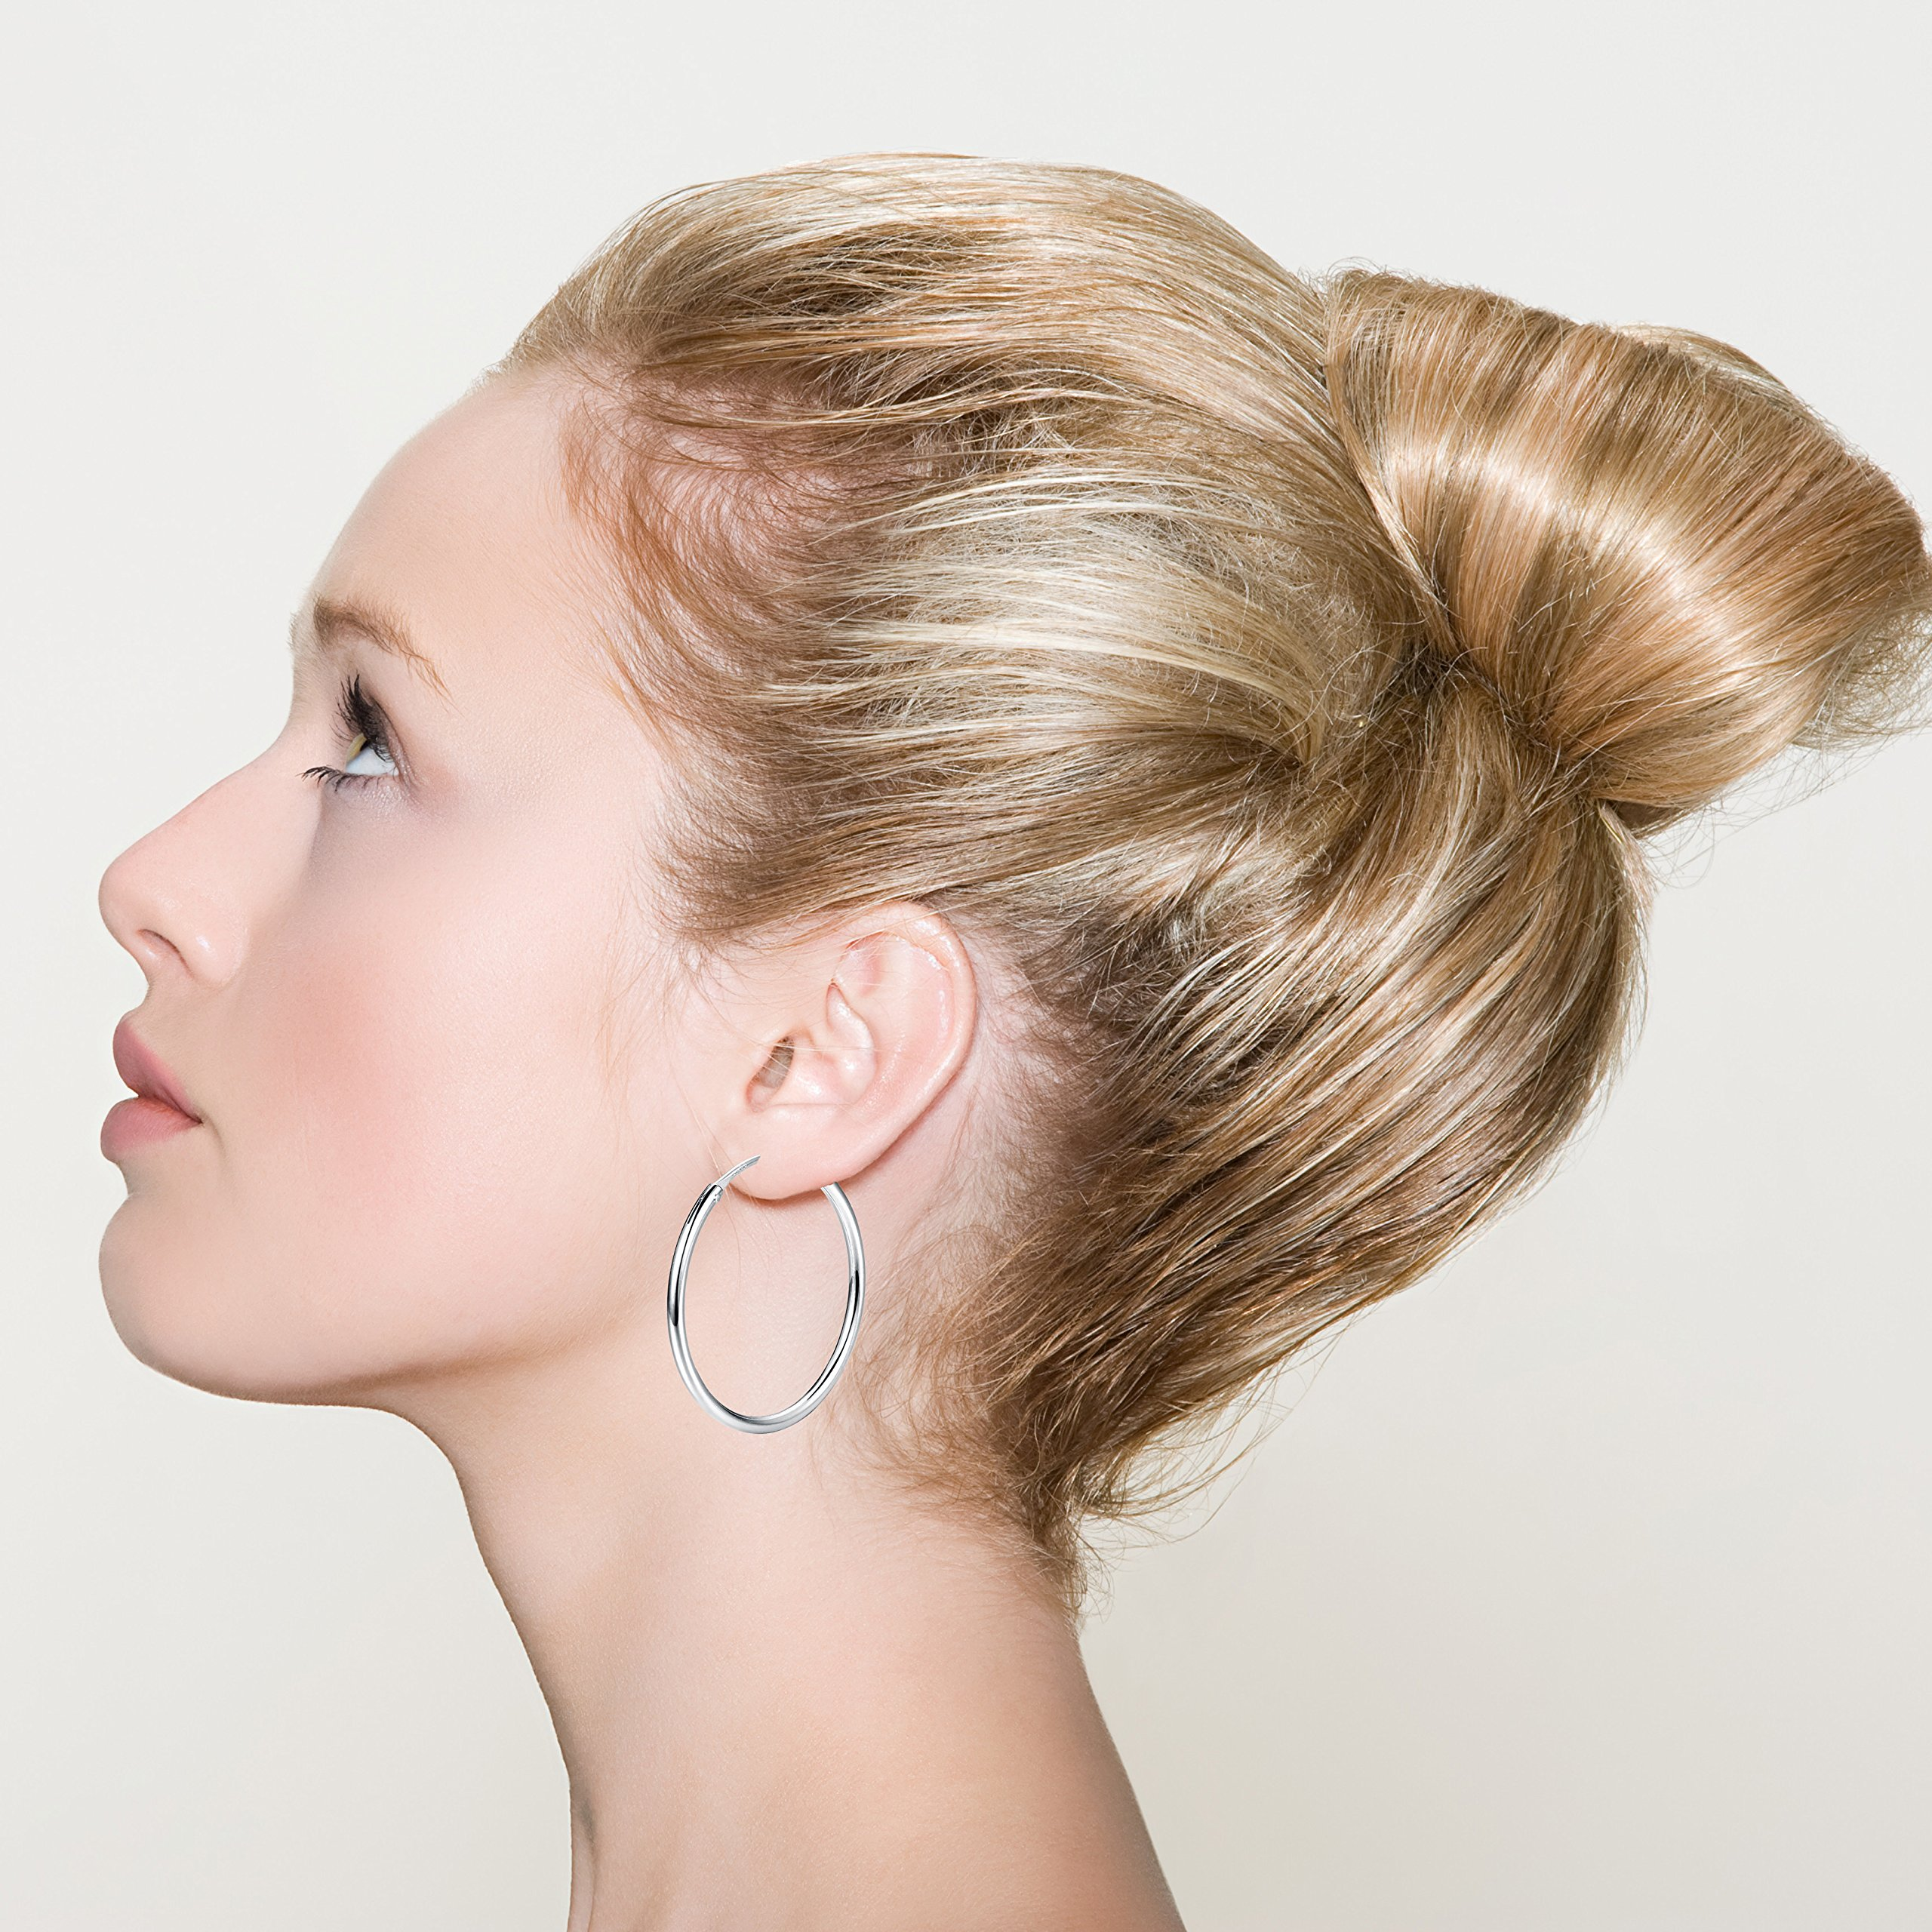 FUNRUN JEWELRY 3 Pairs Sterling Silver Hoop Earrings for Women Men Round Earrings Set 10-40MM (B: Platinum-Plated 3 Pairs: 20MM/30MM/40MM) by FUNRUN JEWELRY (Image #2)